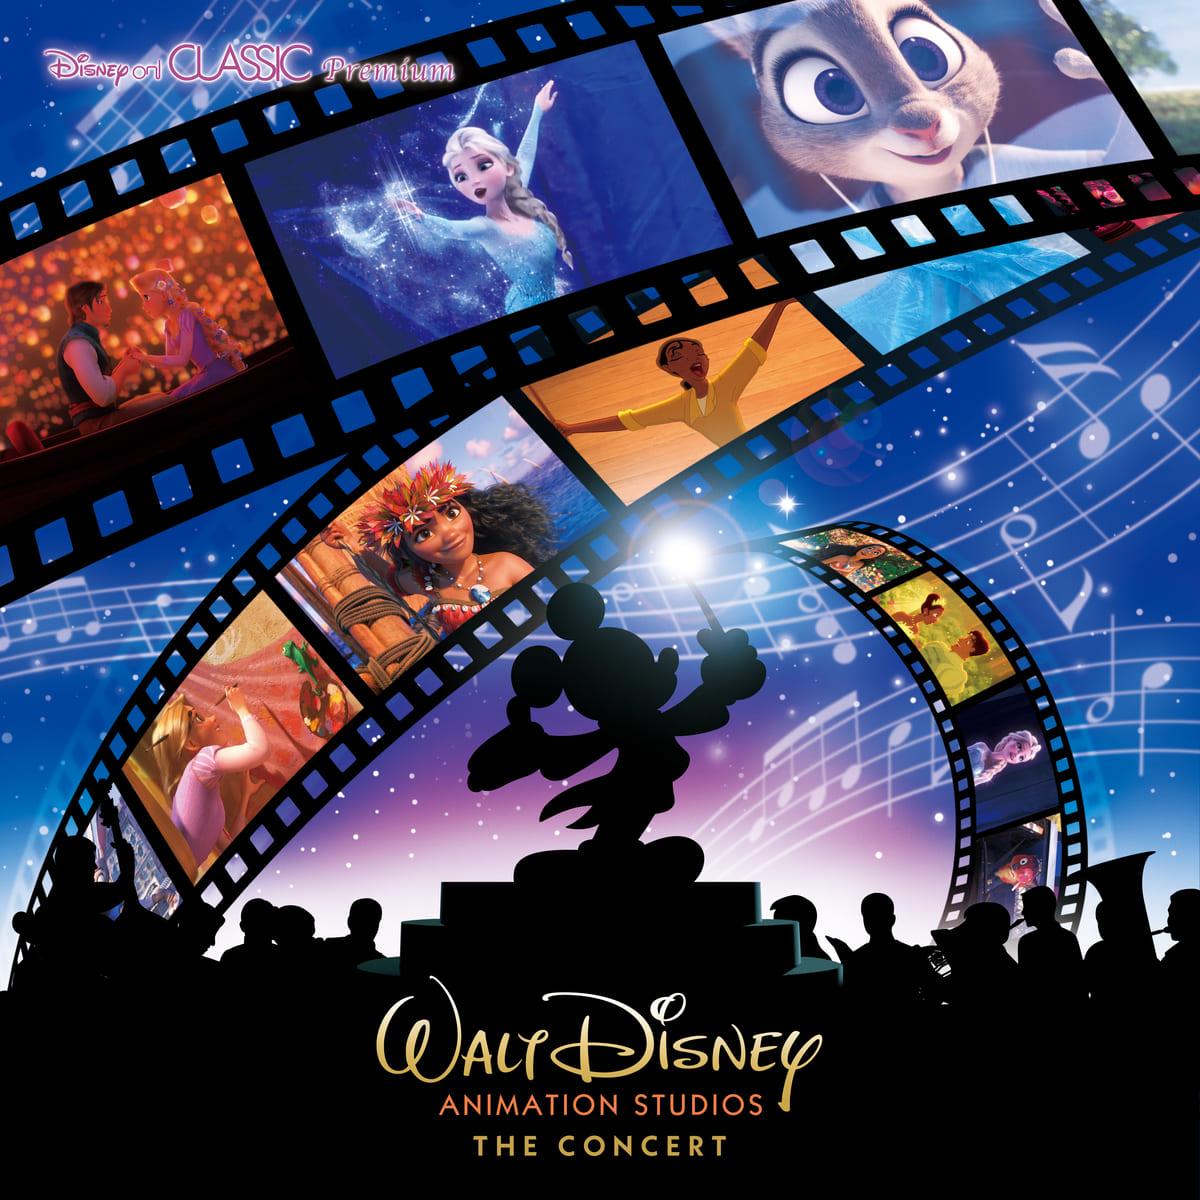 "Disney on CLASSIC Premium ウォルト・ディズニー・アニメーション・スタジオ ""ザ・コンサート"""